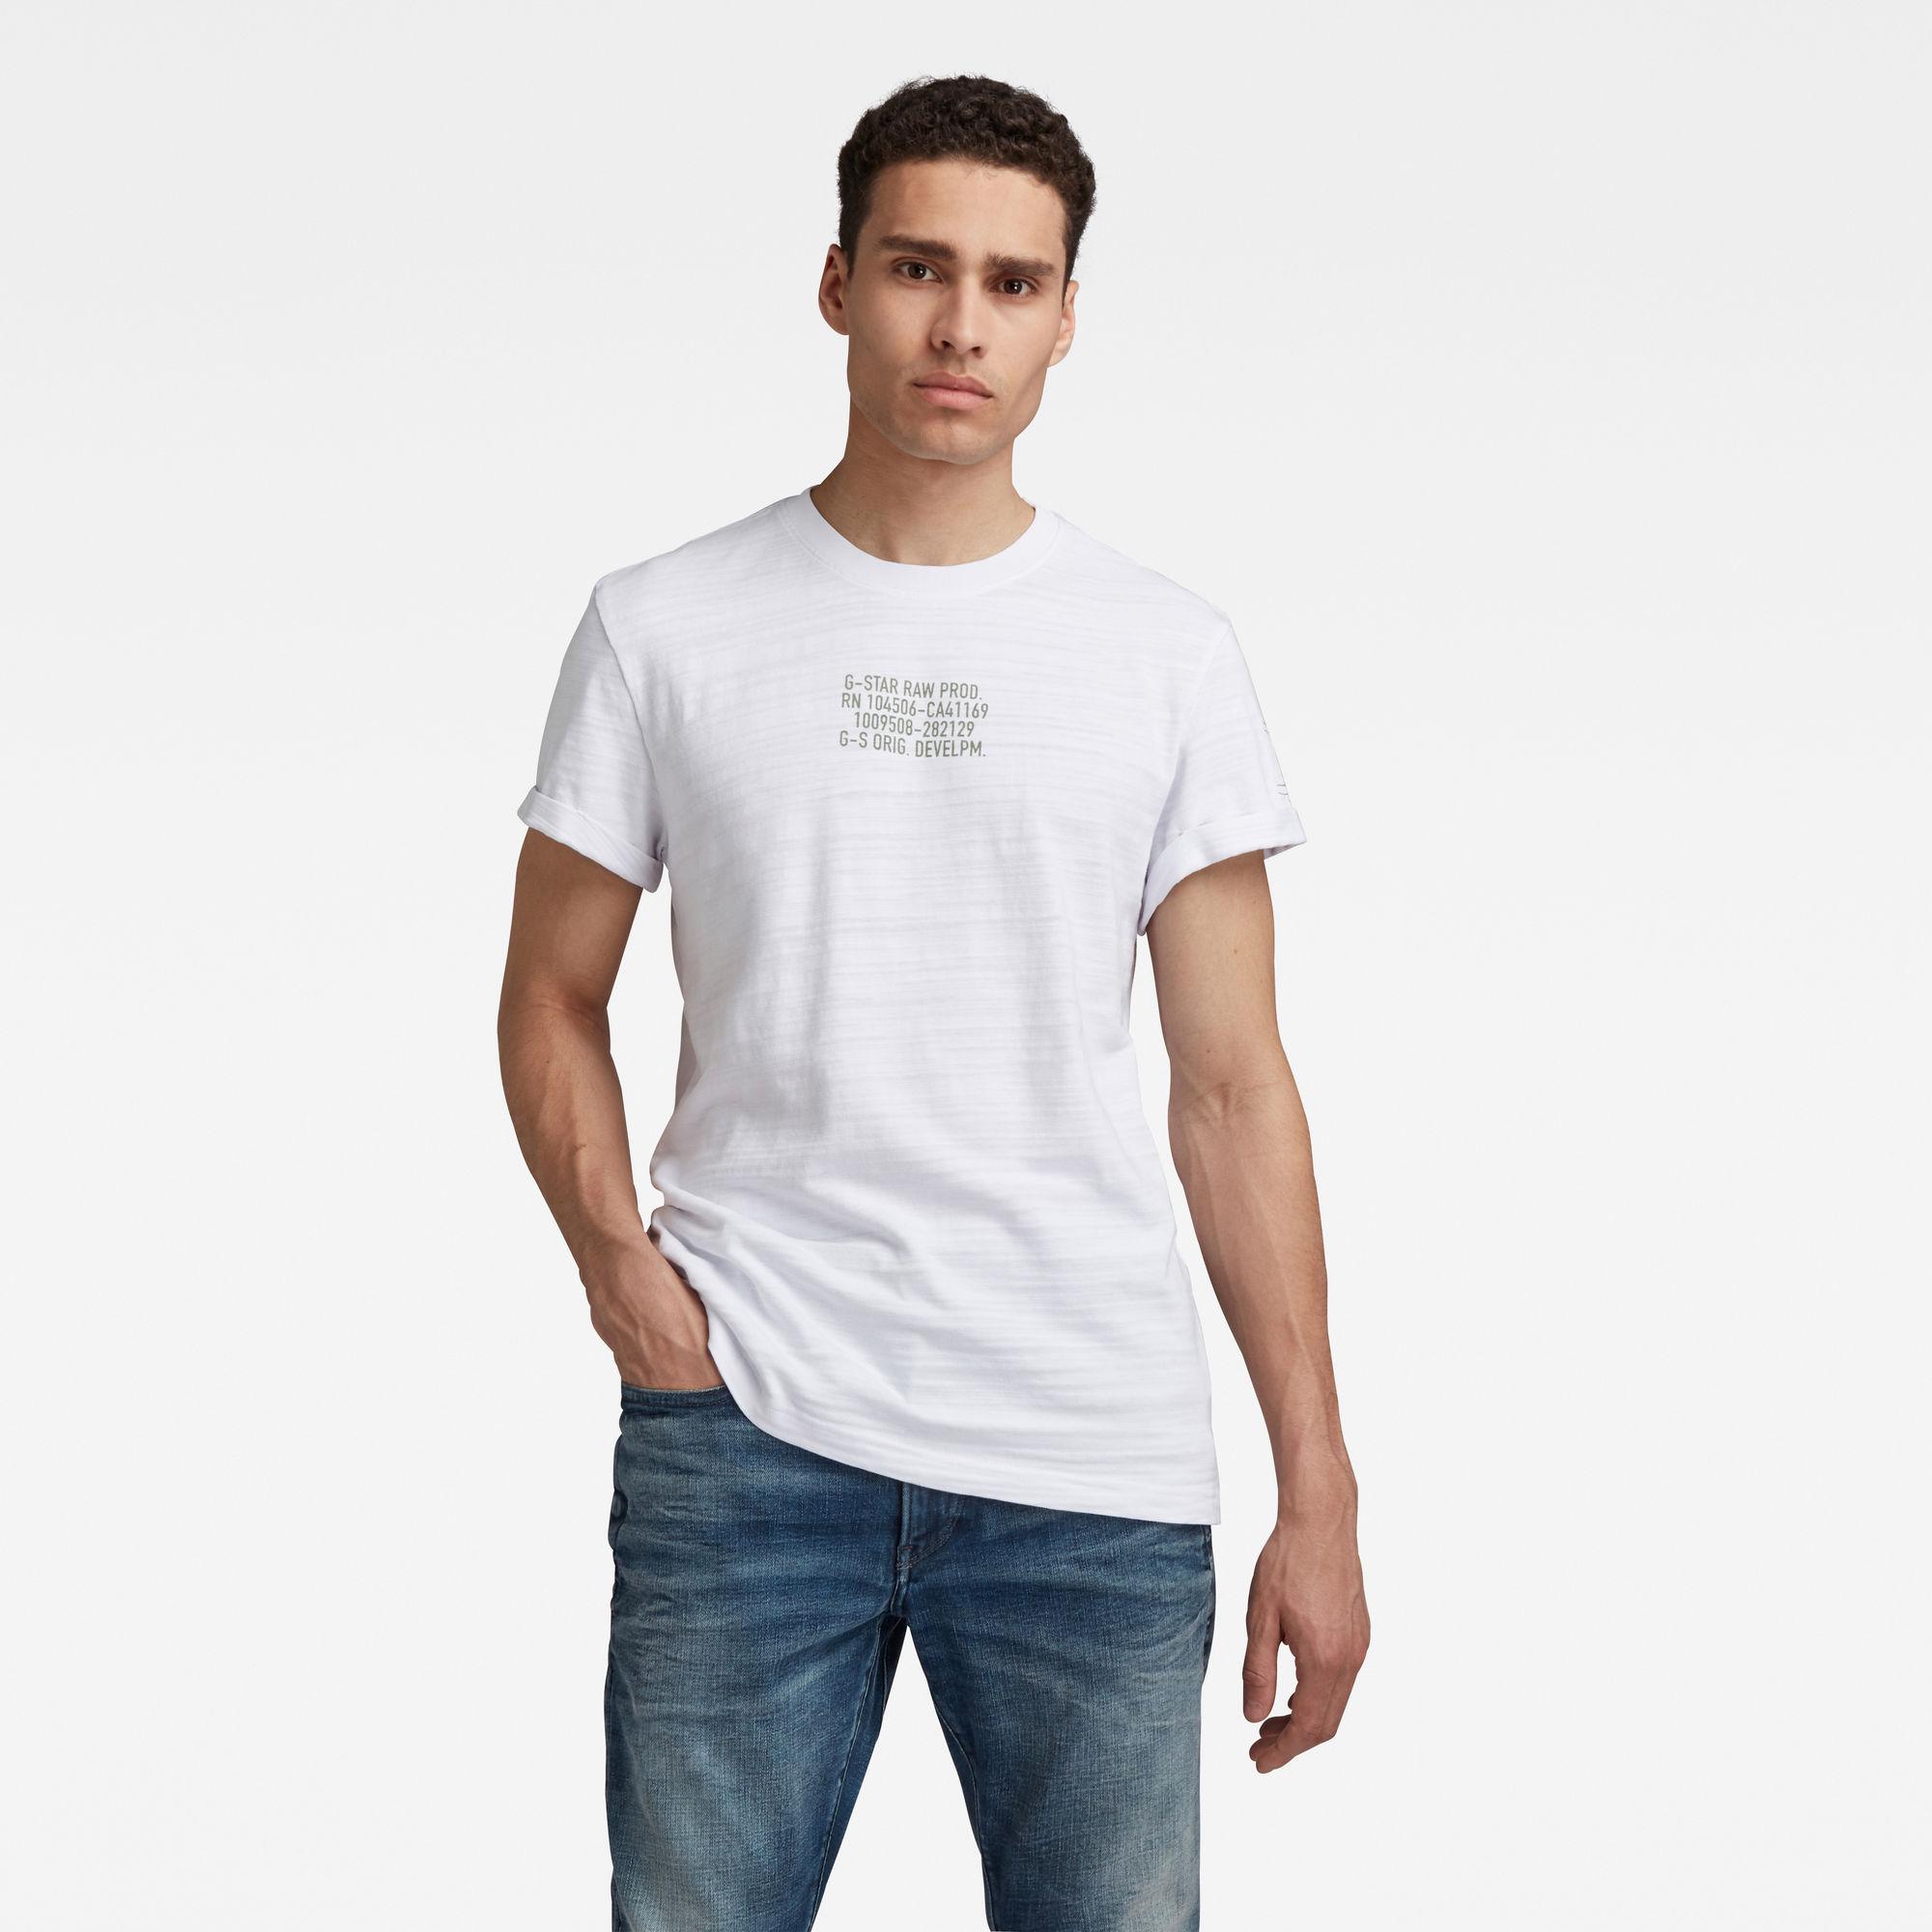 G-star RAW Hommes T-shirt Chest Text Graphic Lash Blanc  - Taille: M L XXS XXL XS XL S